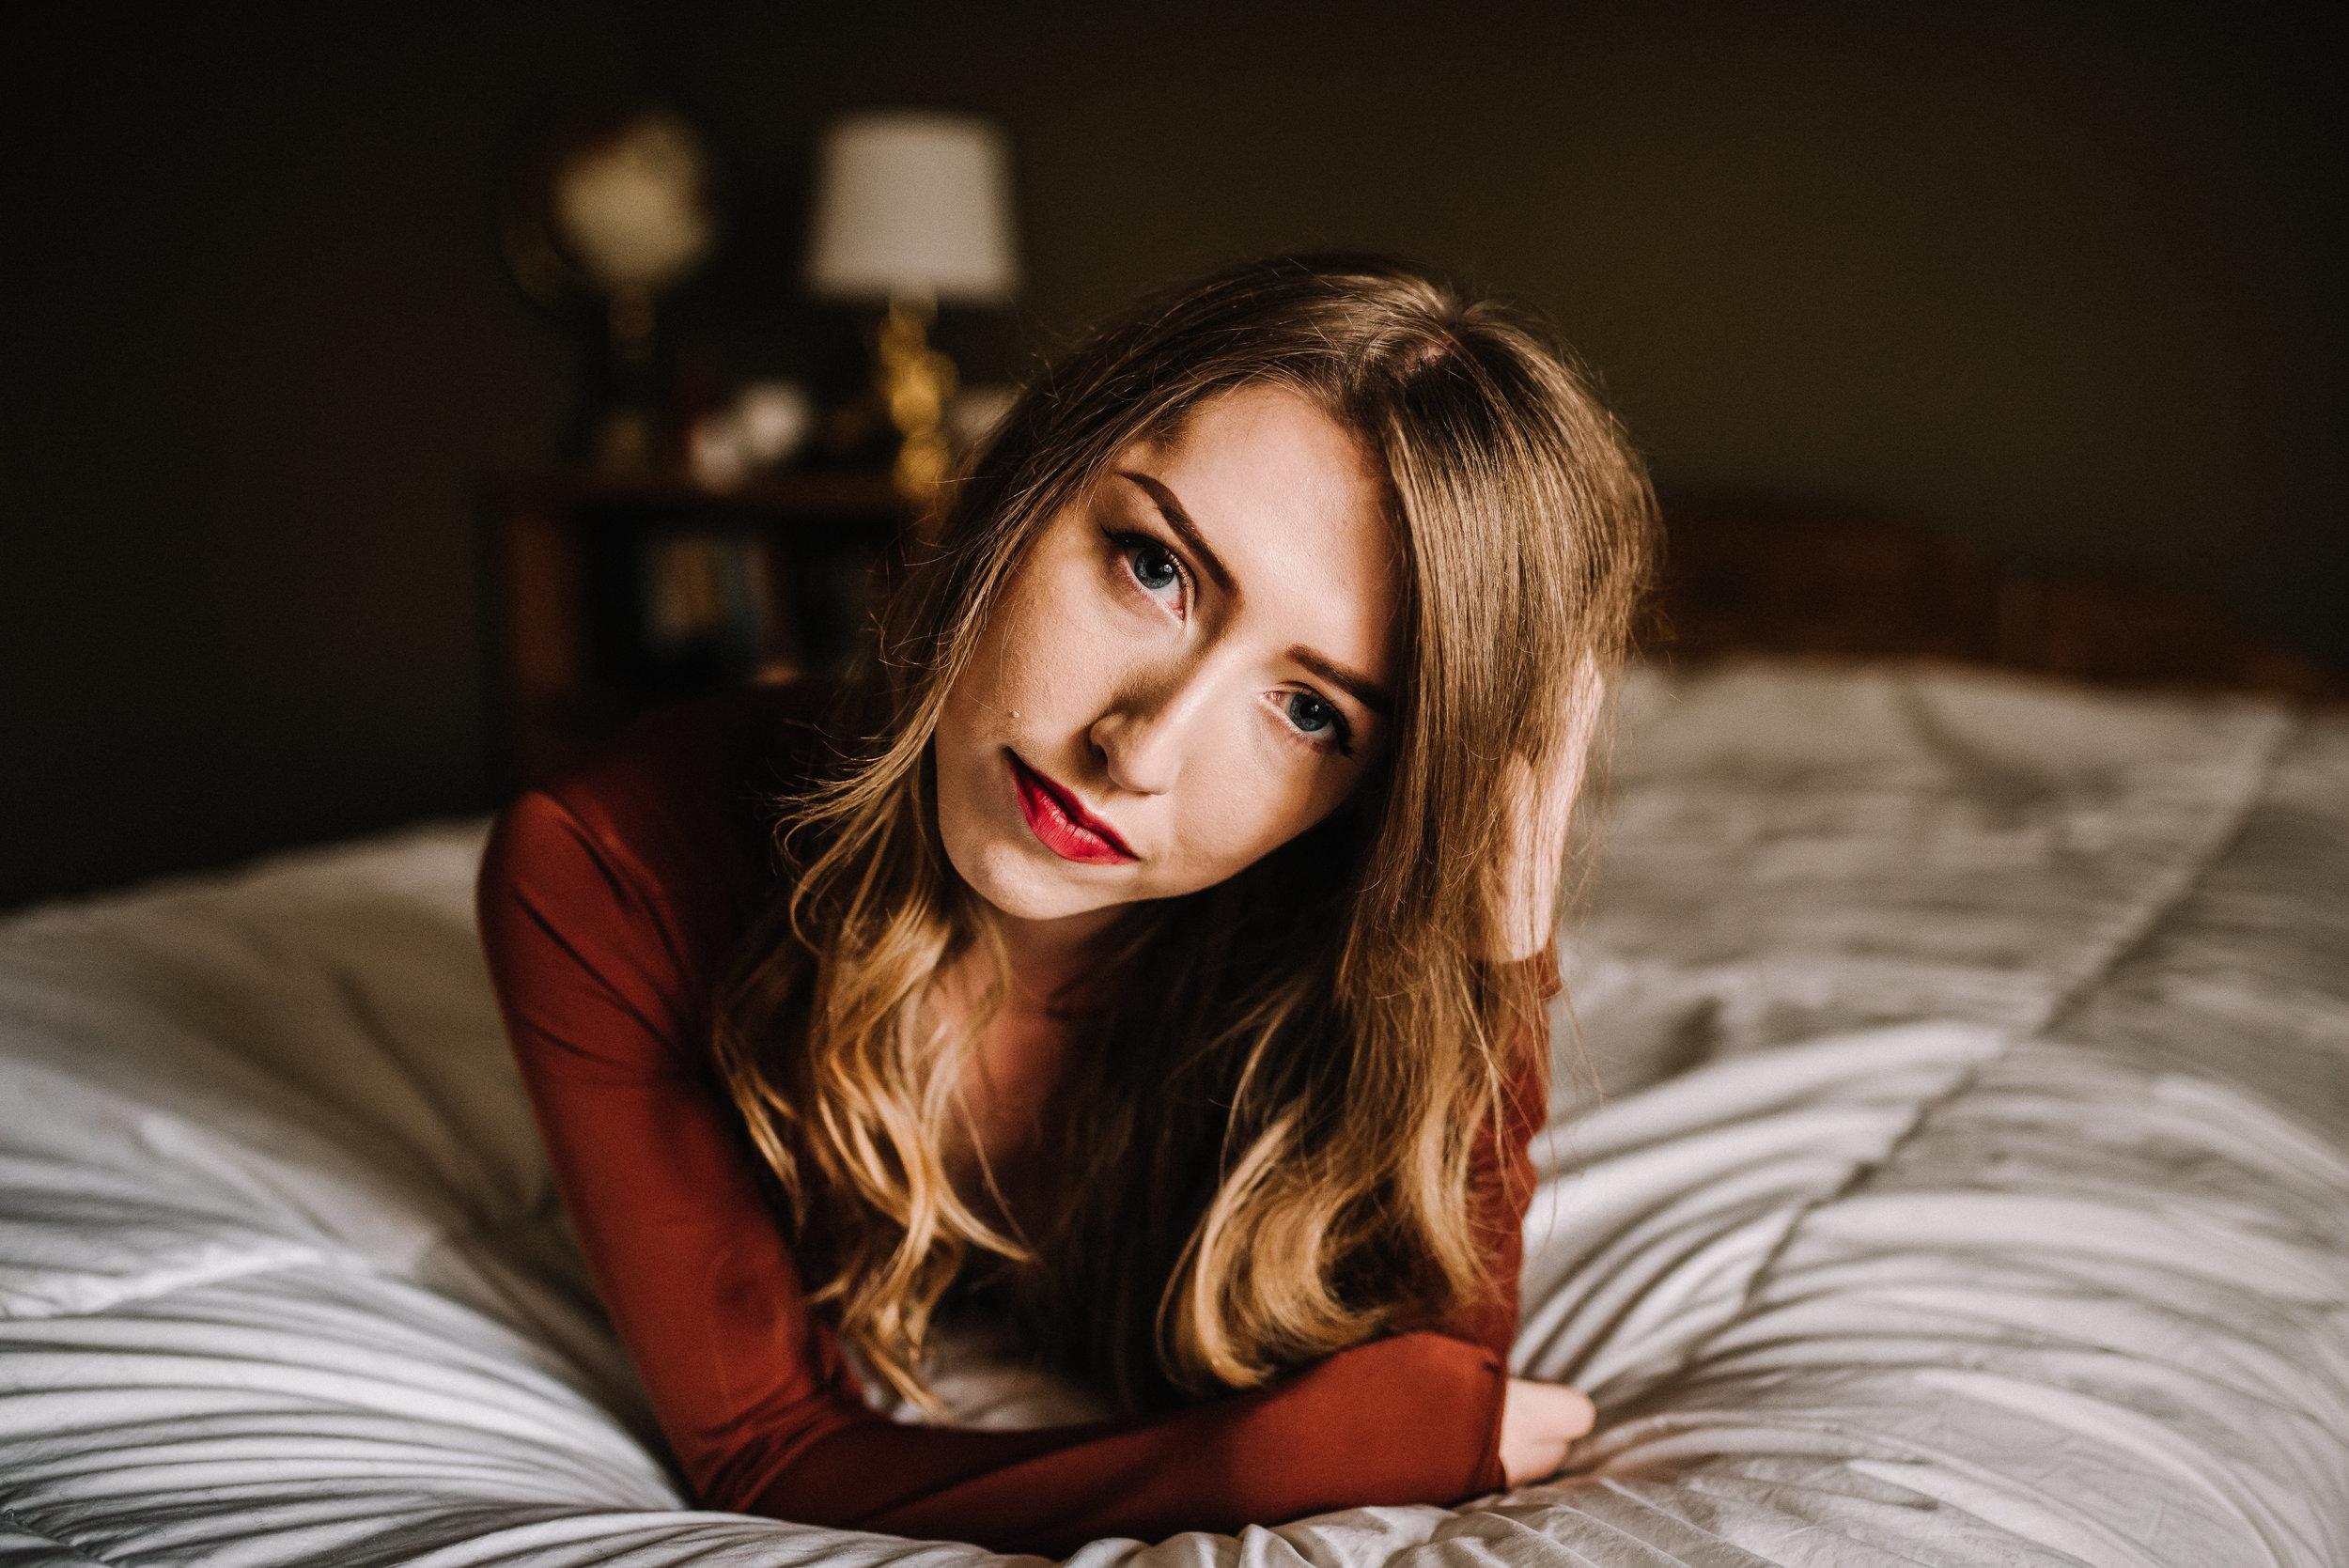 Kaitlyn_Ashley-Benham-Photography-5.jpg